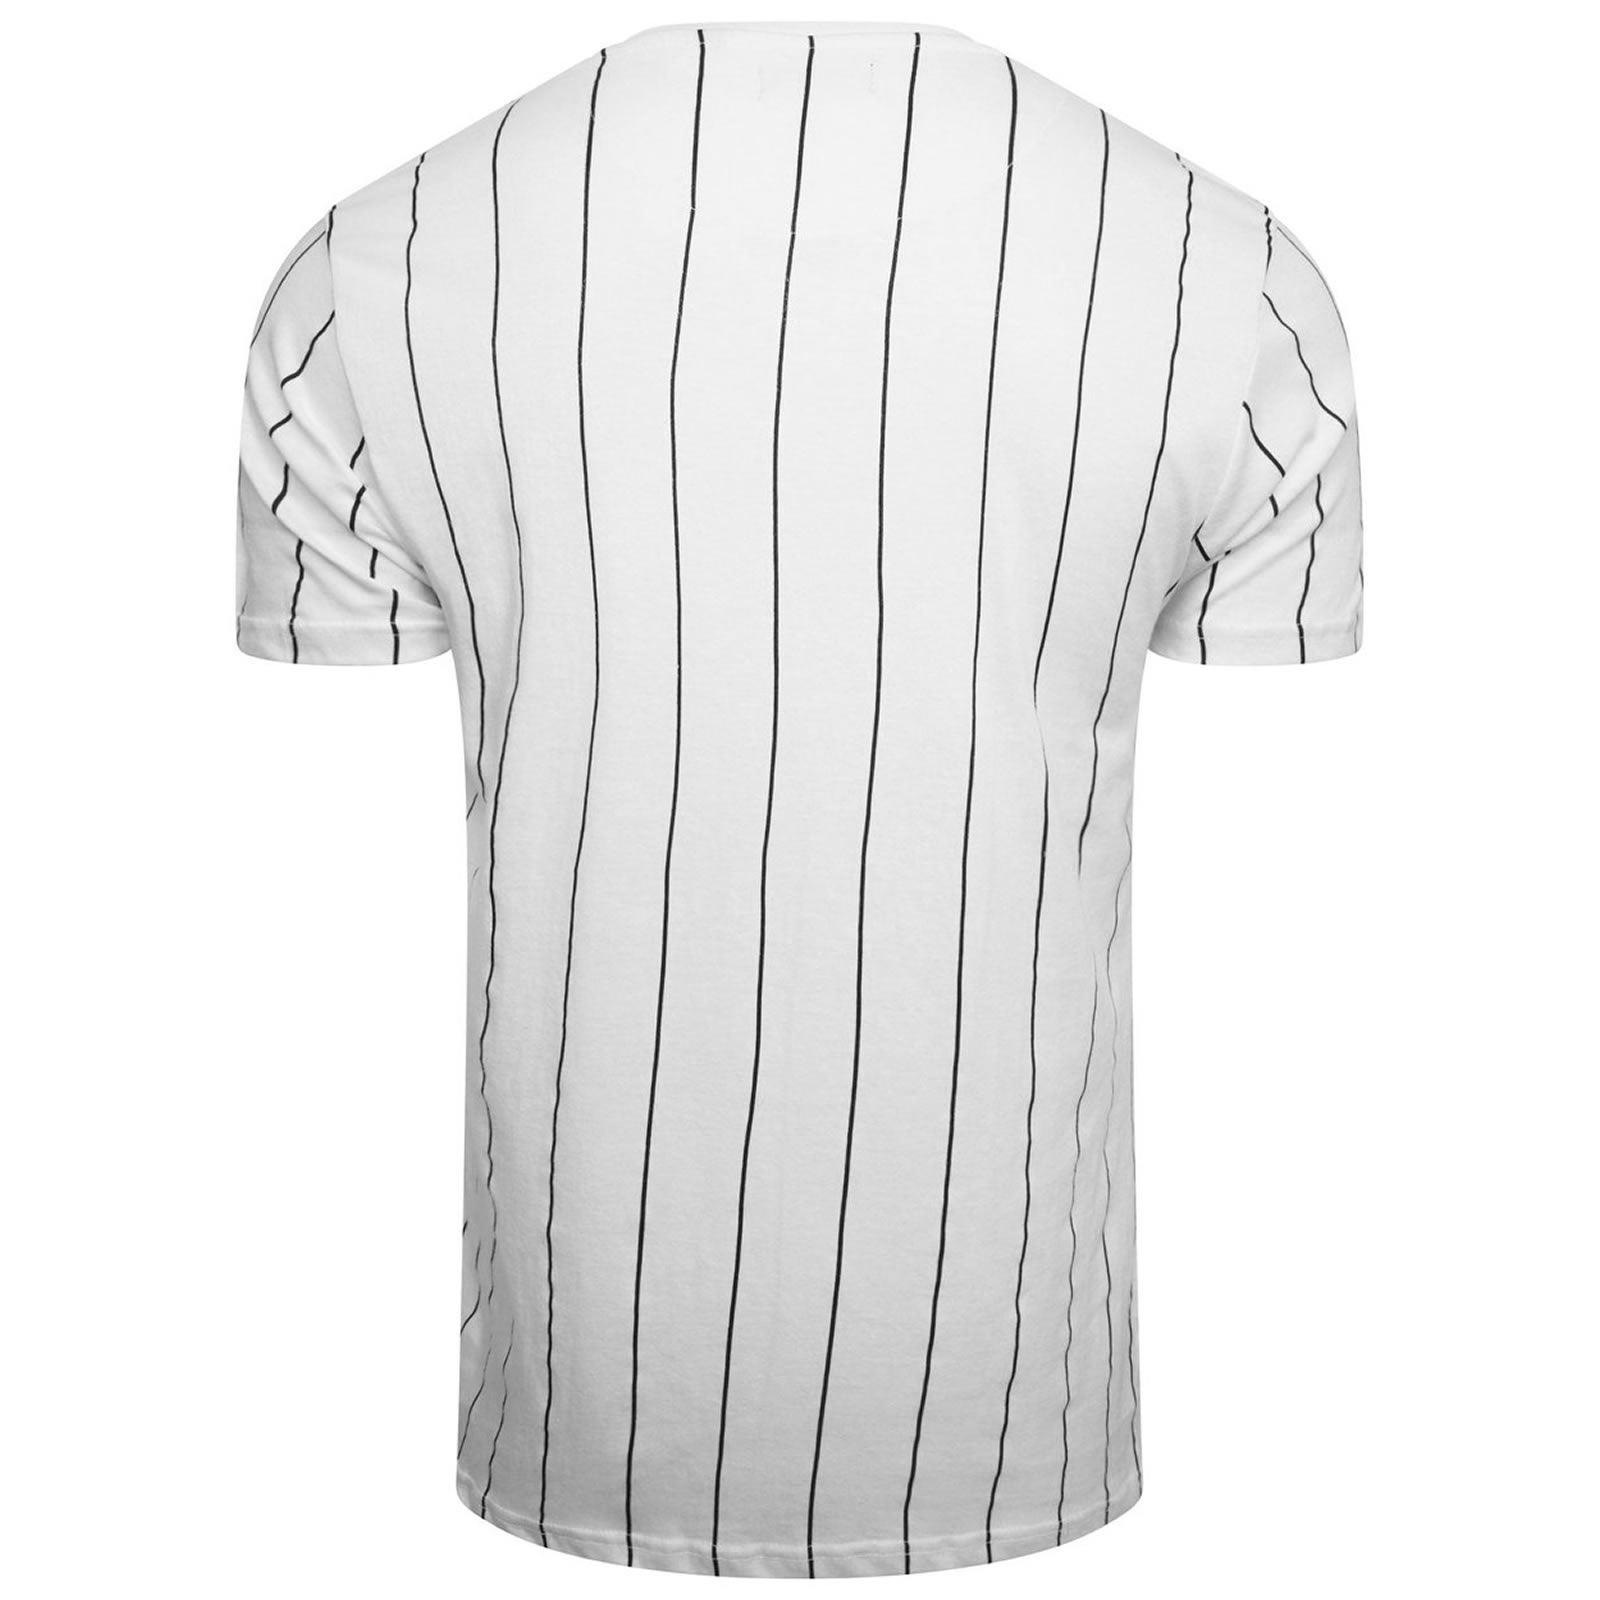 Hommes-T-Shirt-Brave-Soul-Stobart-a-encolure-ras-du-cou-a-manches-courtes-a-rayures-verticales-Tee miniature 5